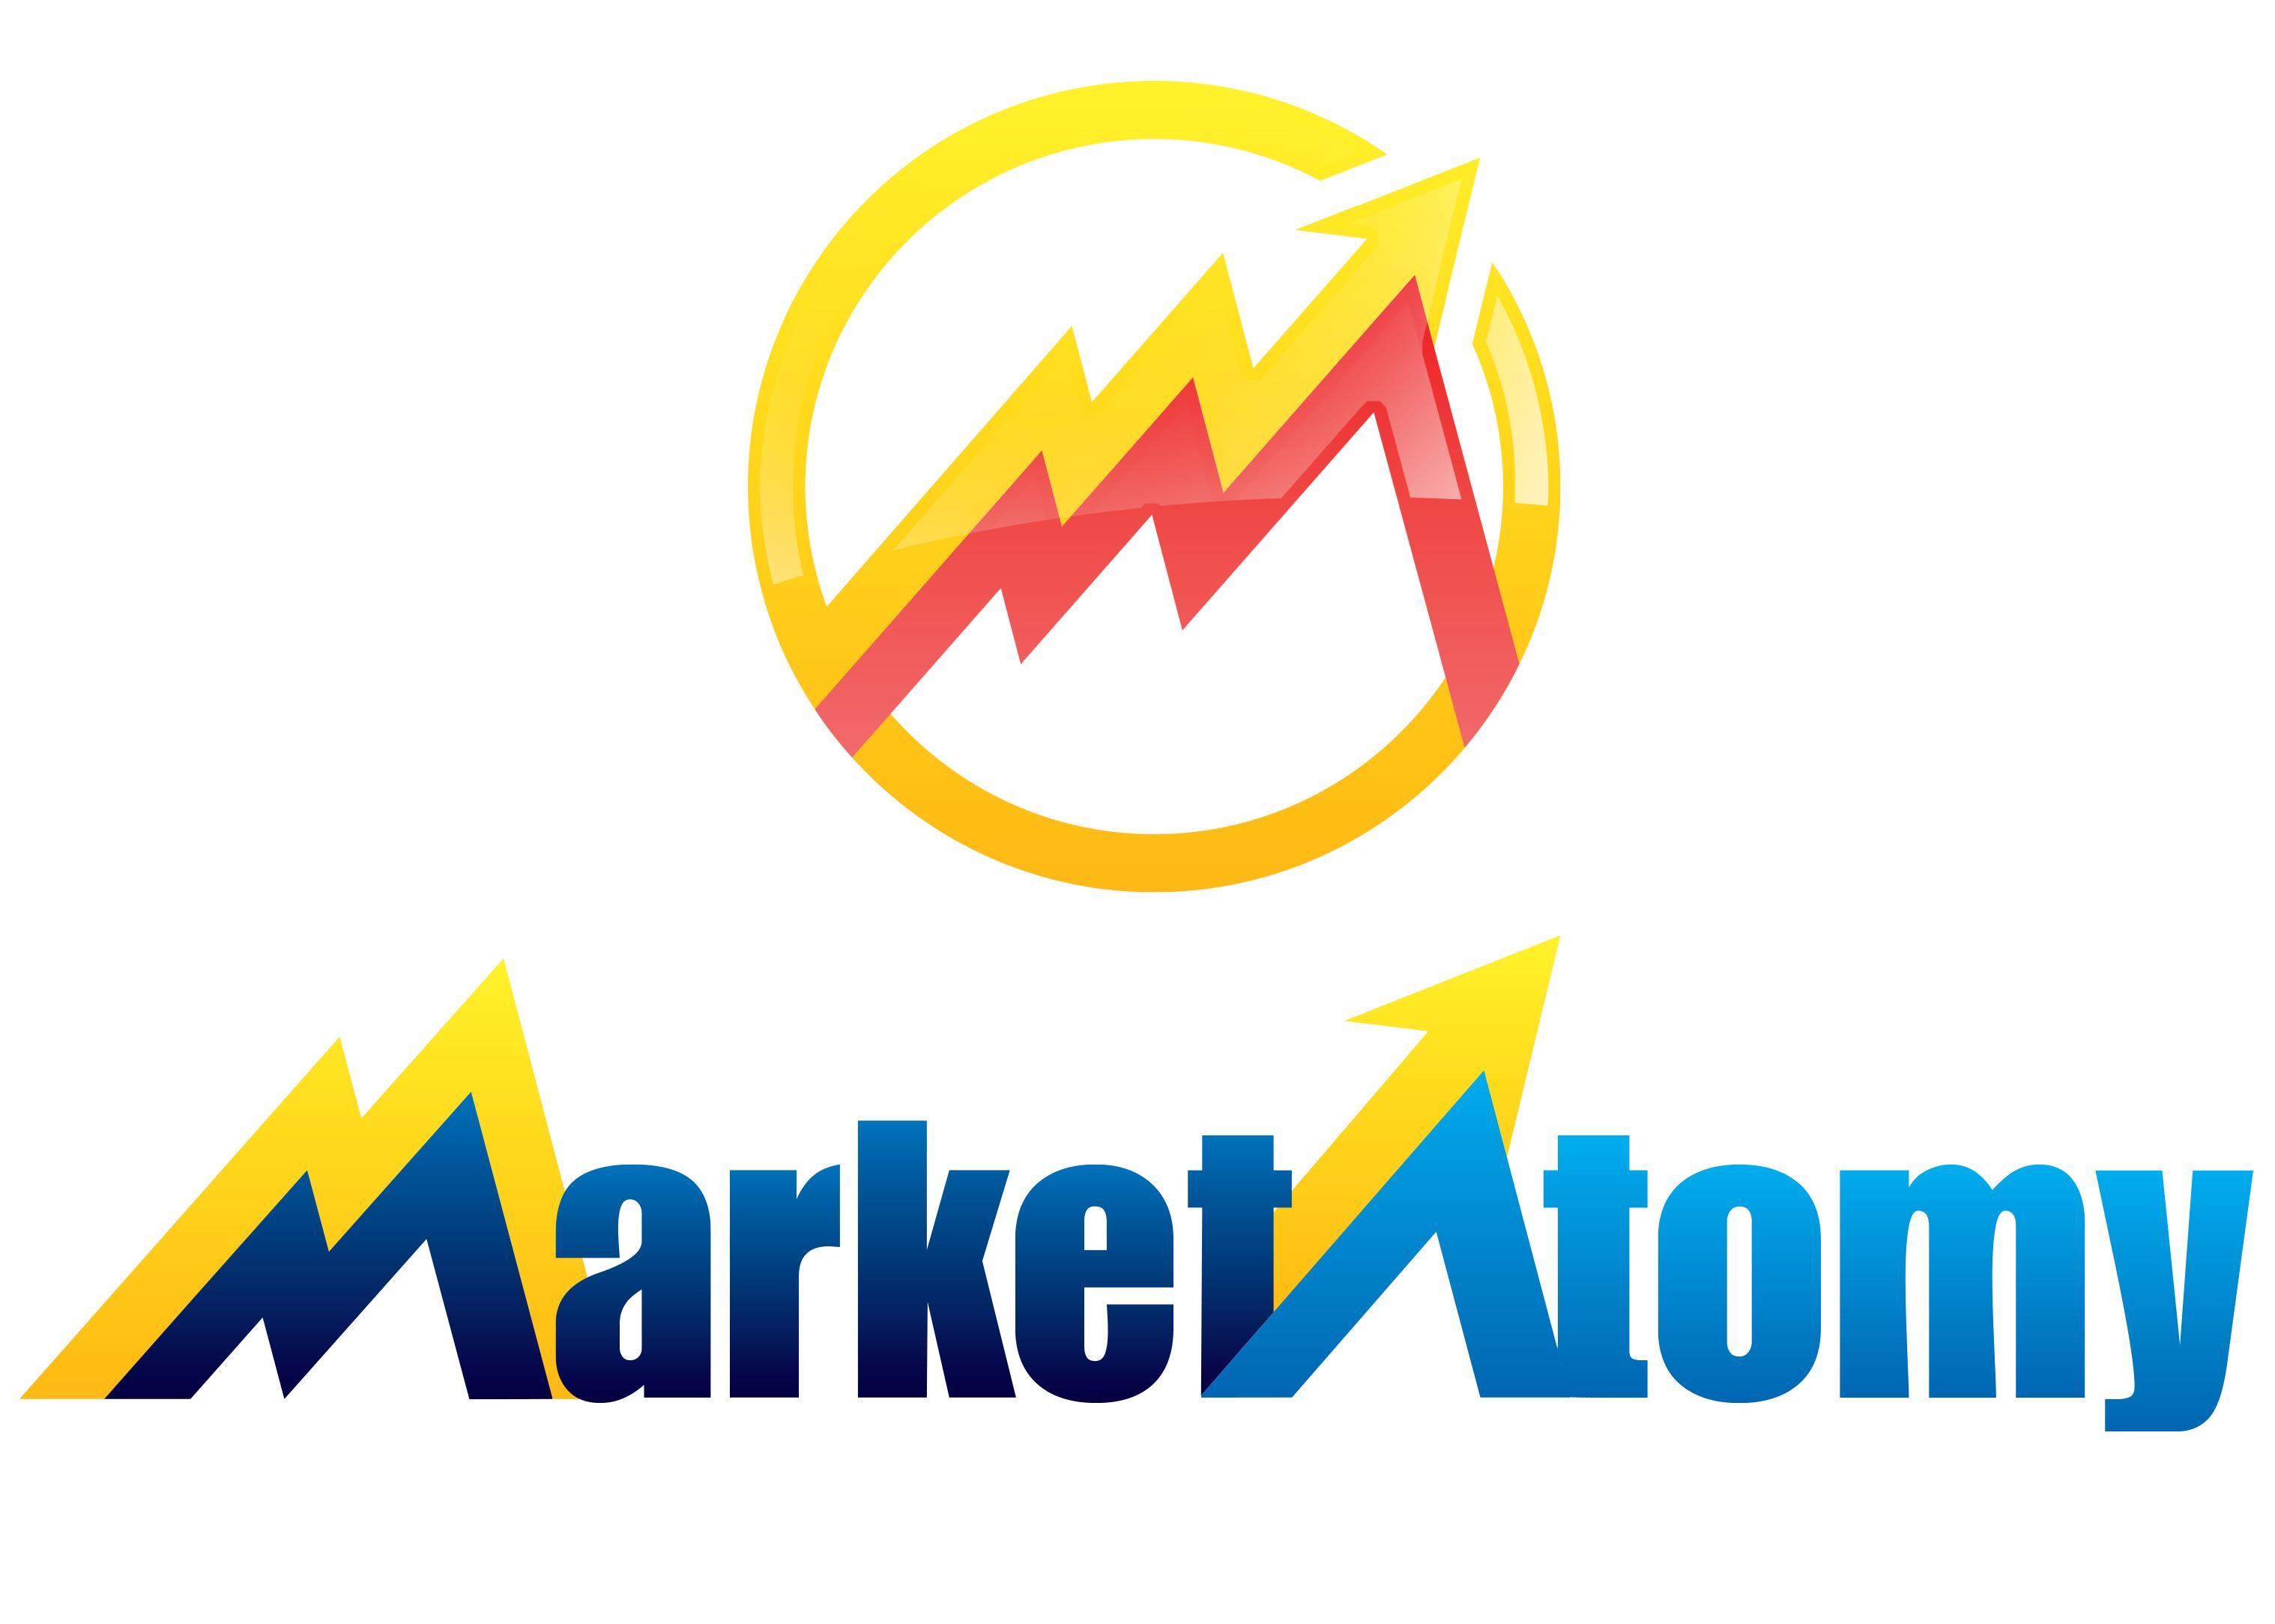 Photo for The MarketAtomy Concept on ViewStub